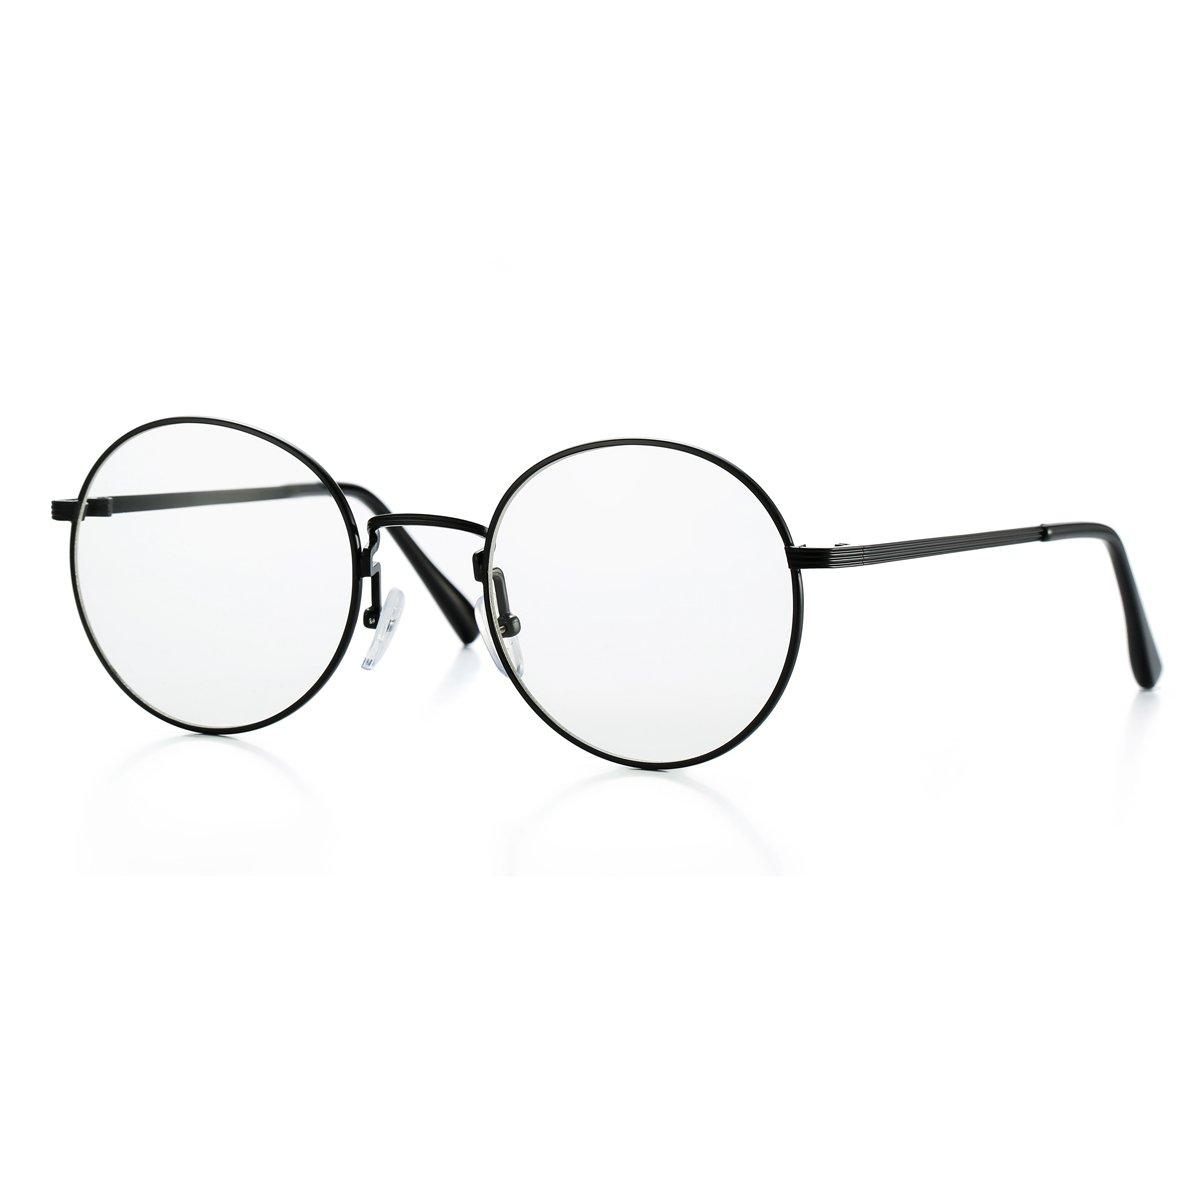 cc8c54426312 Amazon.com  AZORB Non-prescription Round Clear Lens Glasses Circle Eyeglasses  Frame (Black